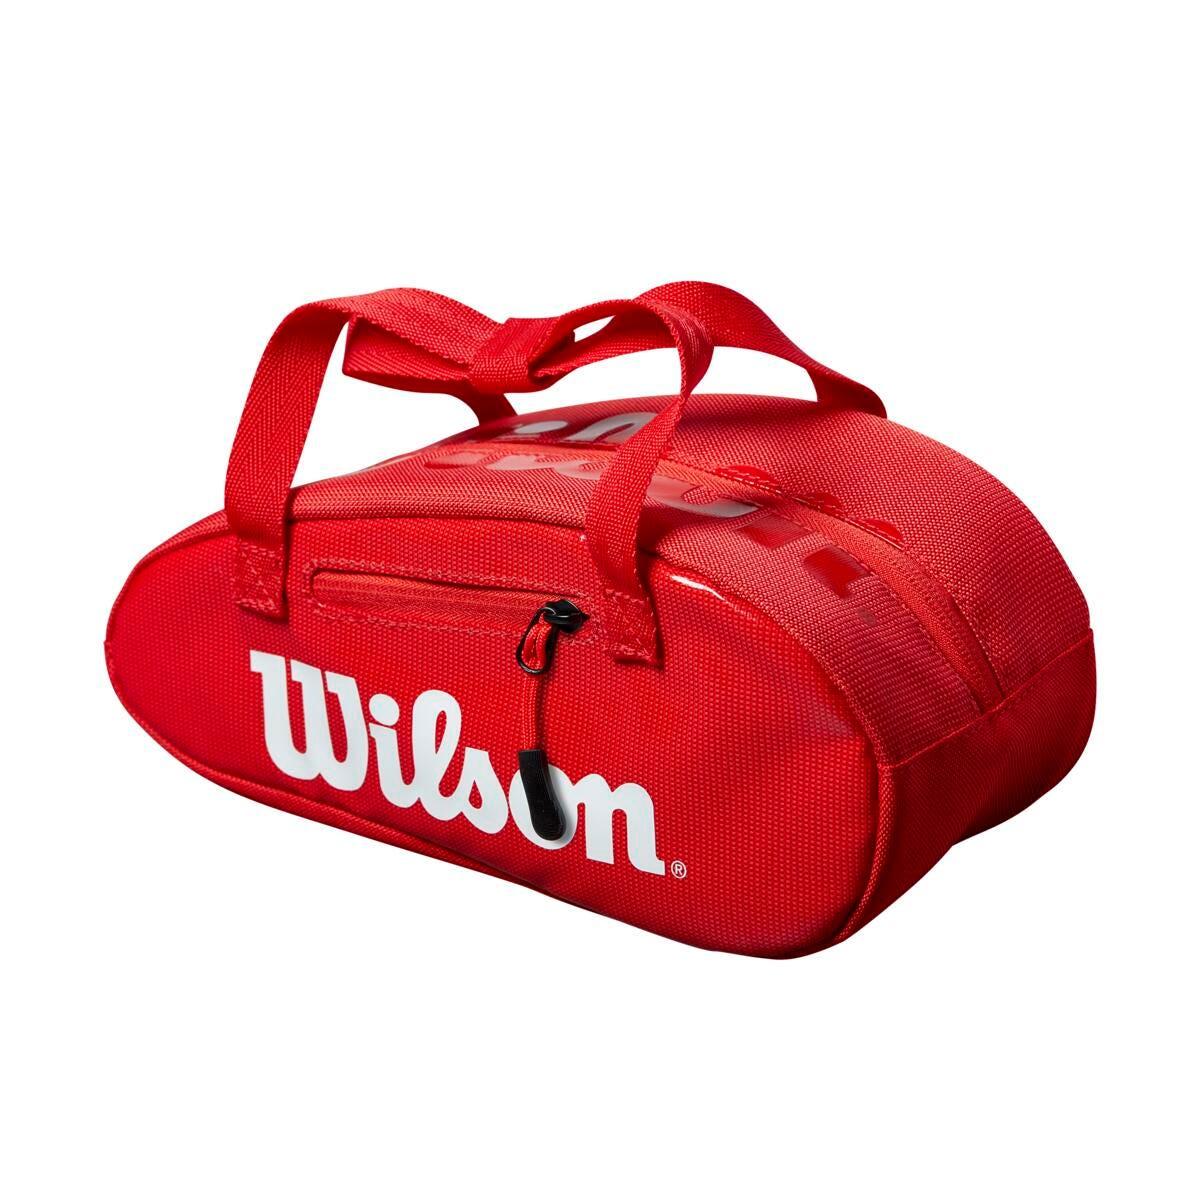 Mini Super Tour Tennis Bag